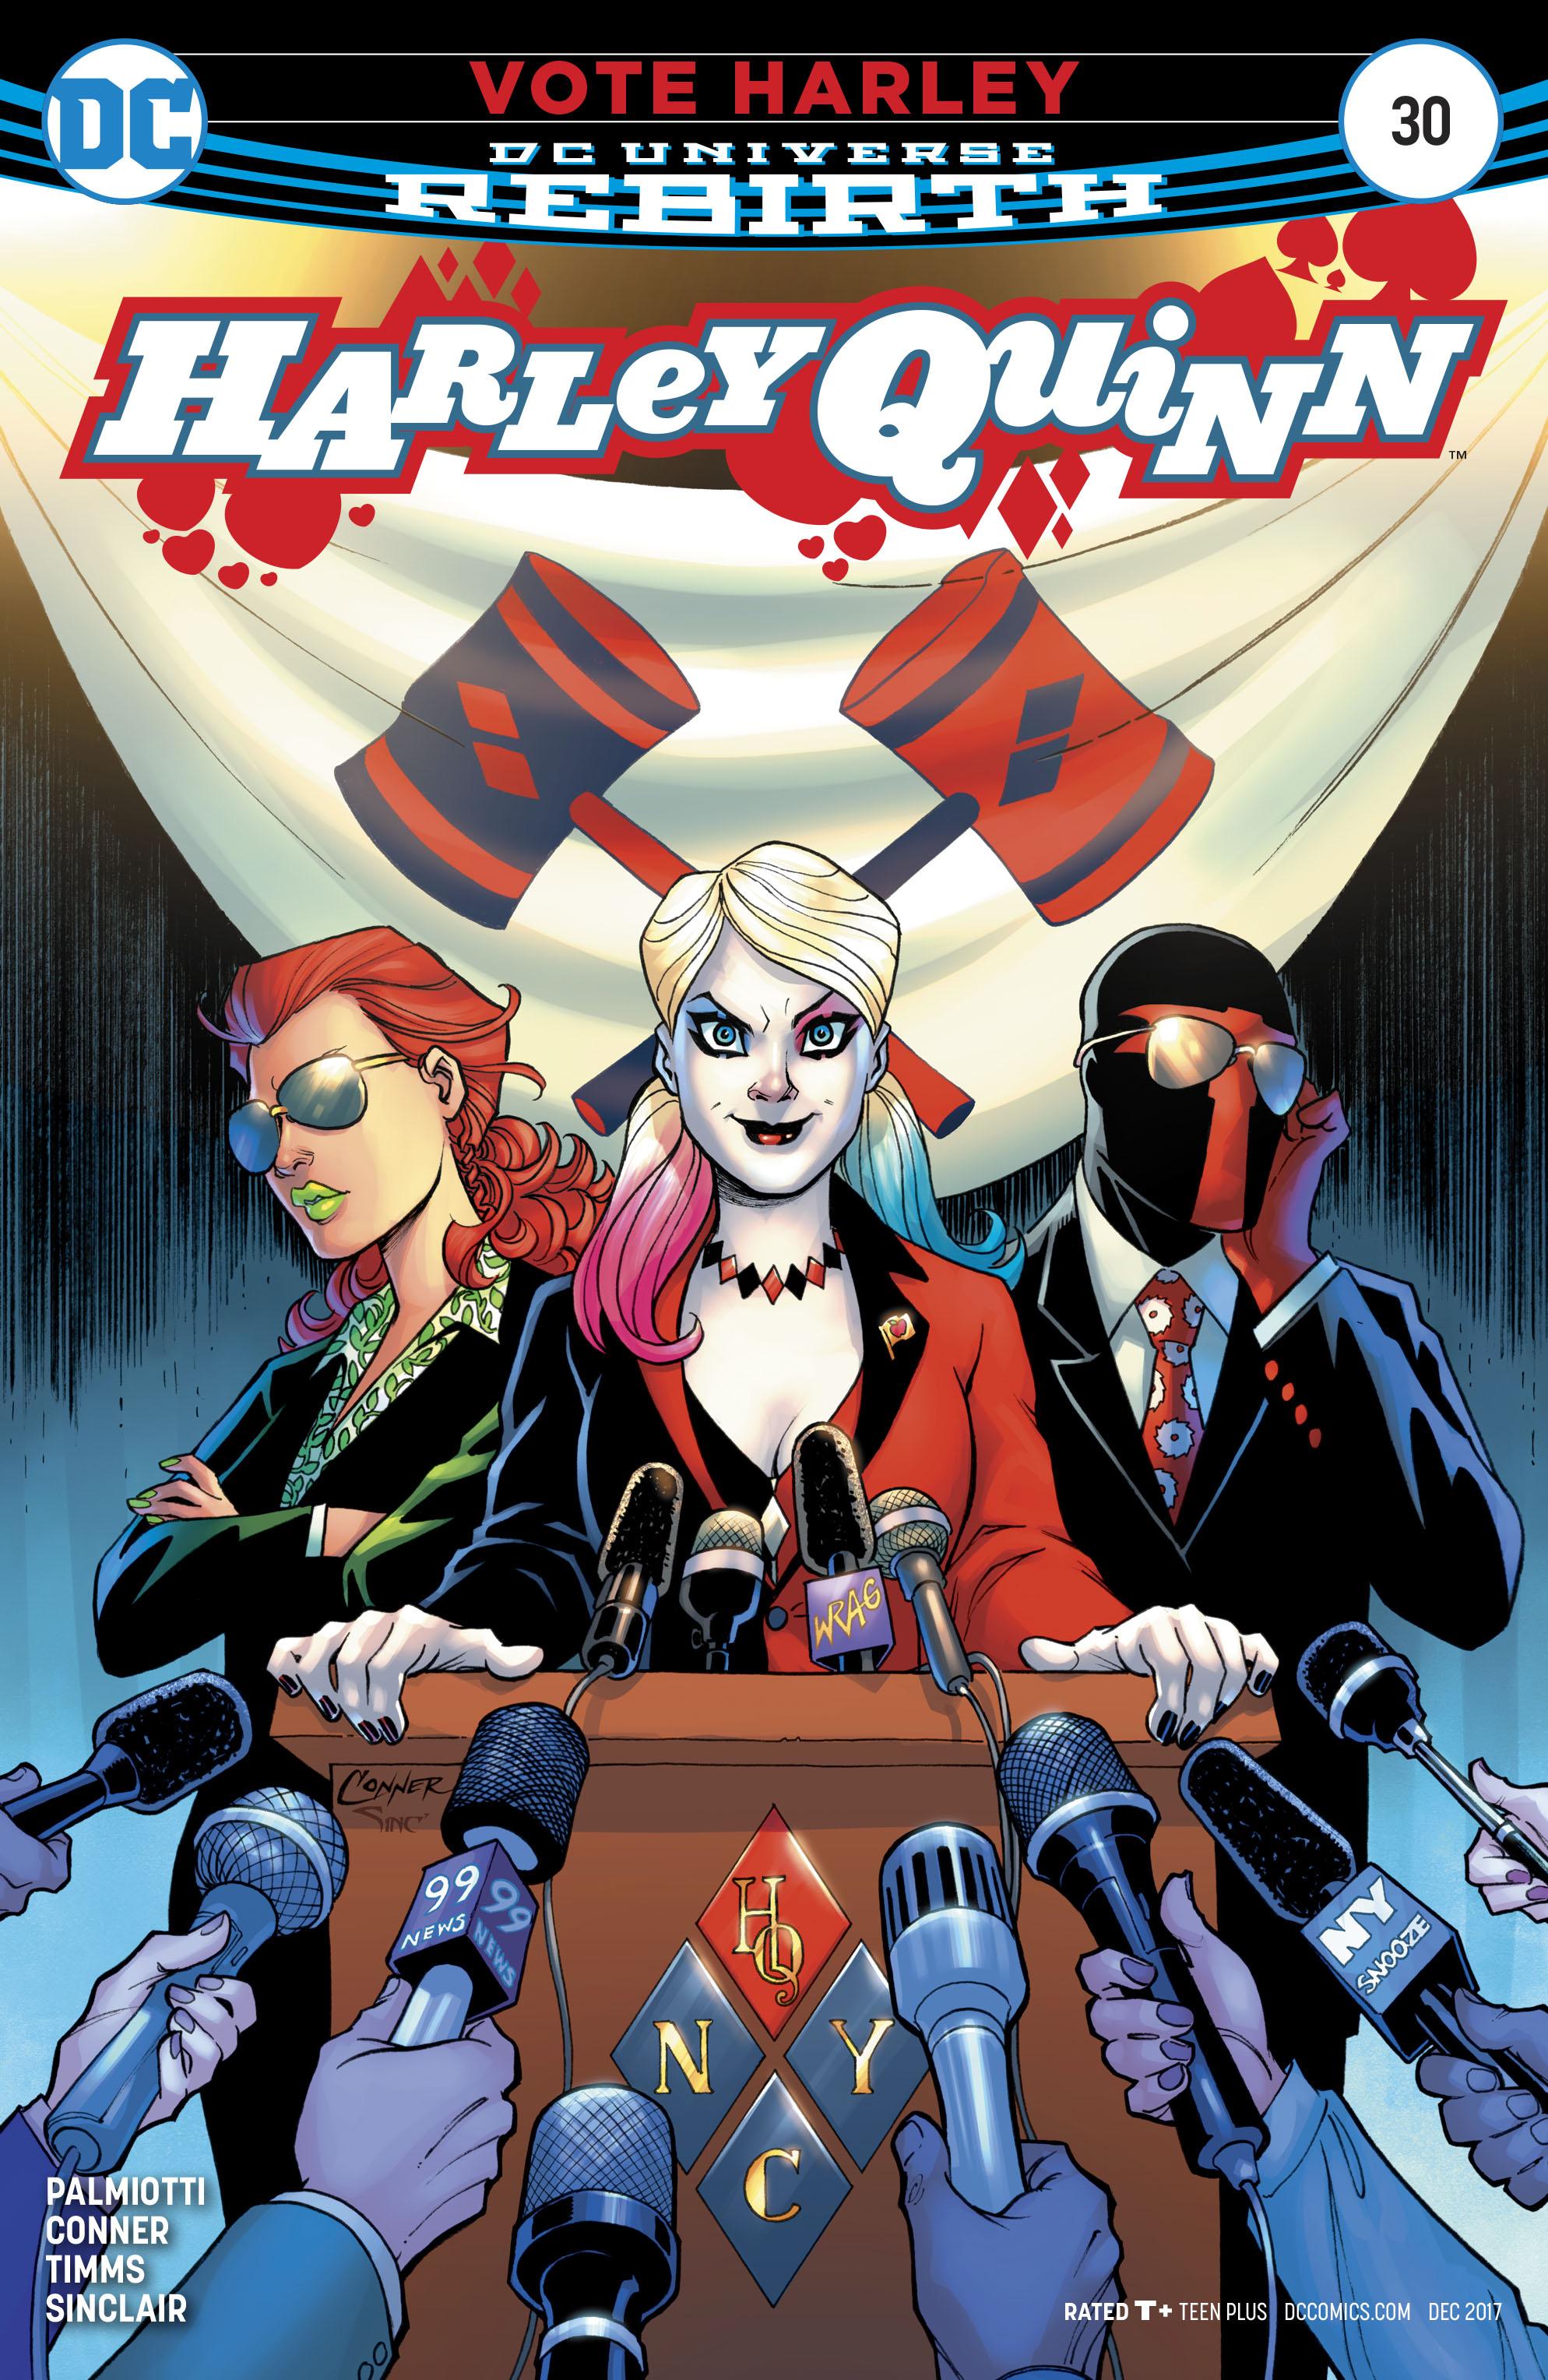 Harley quinn porno stripovi